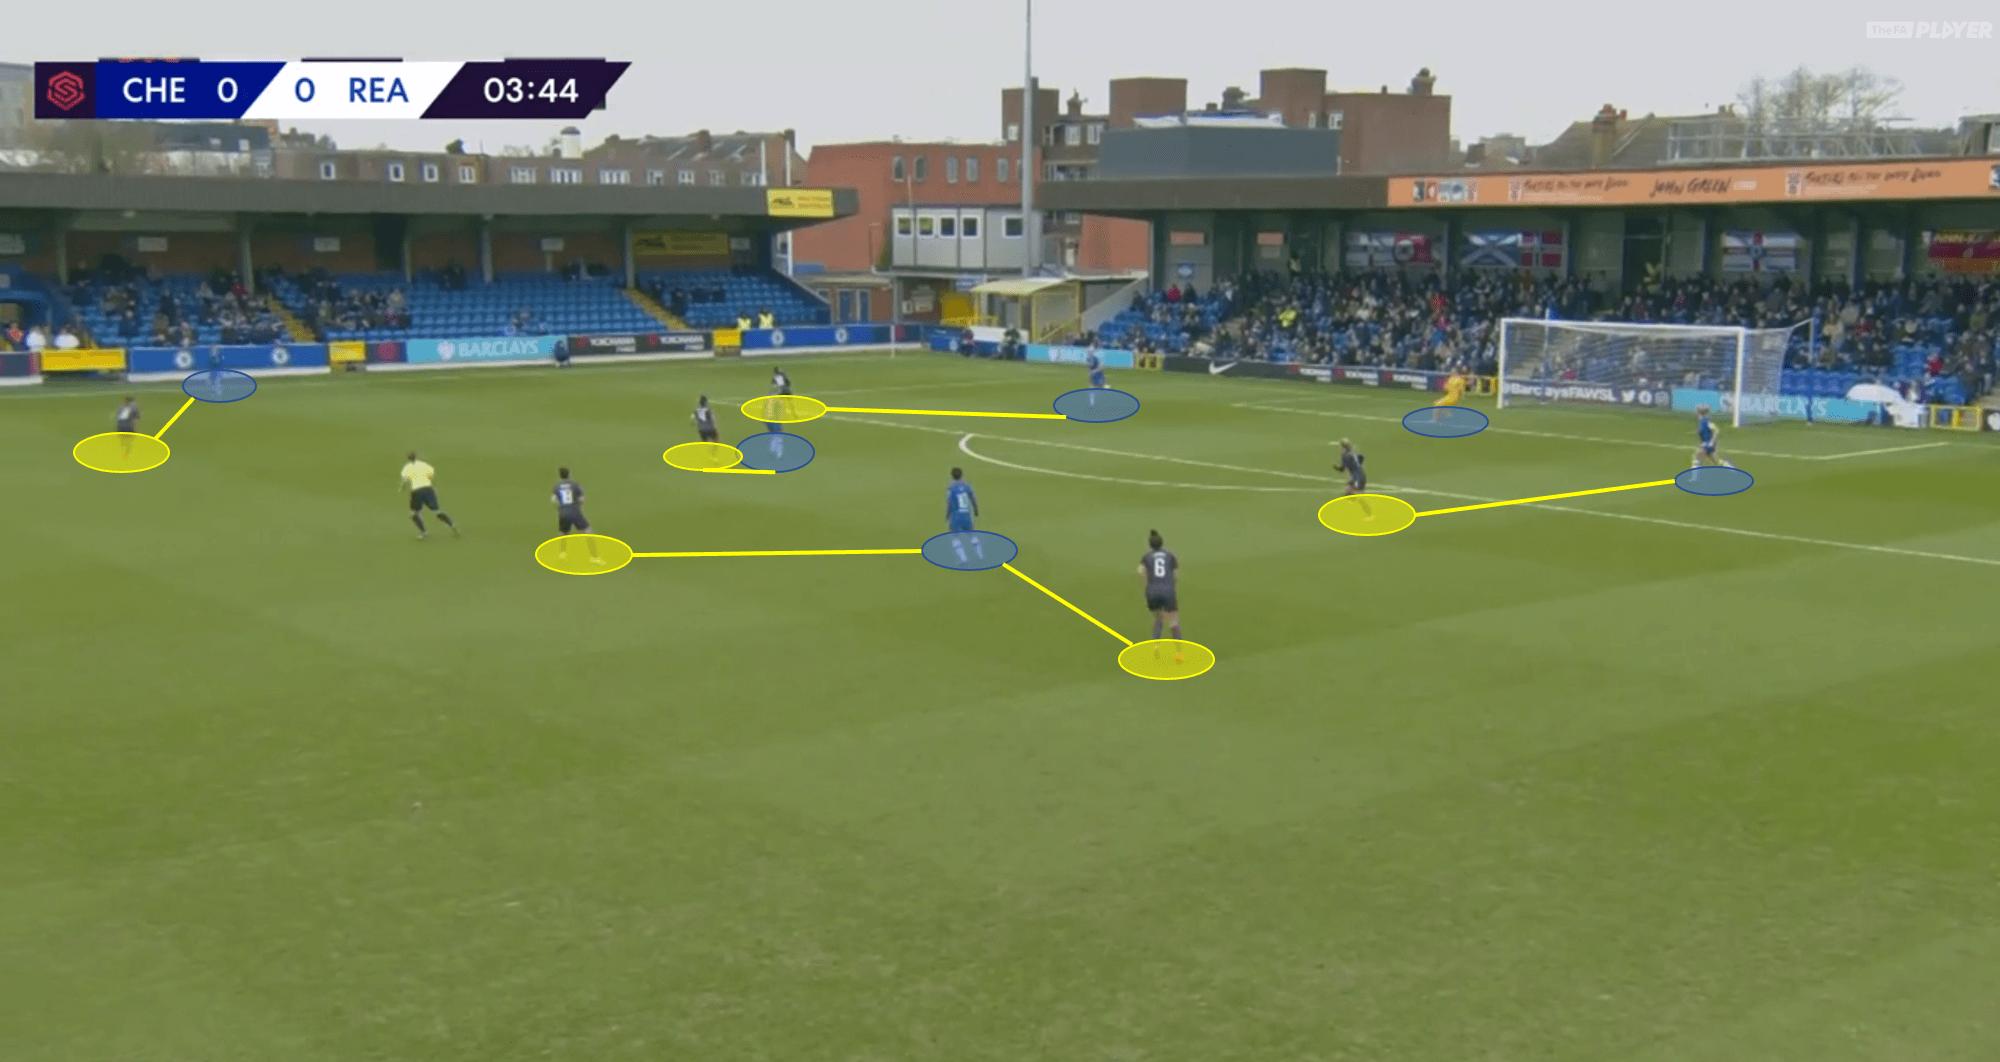 FAWSL 2019/20: Chelsea Women vs Reading Women - Tactical Analysis tactics